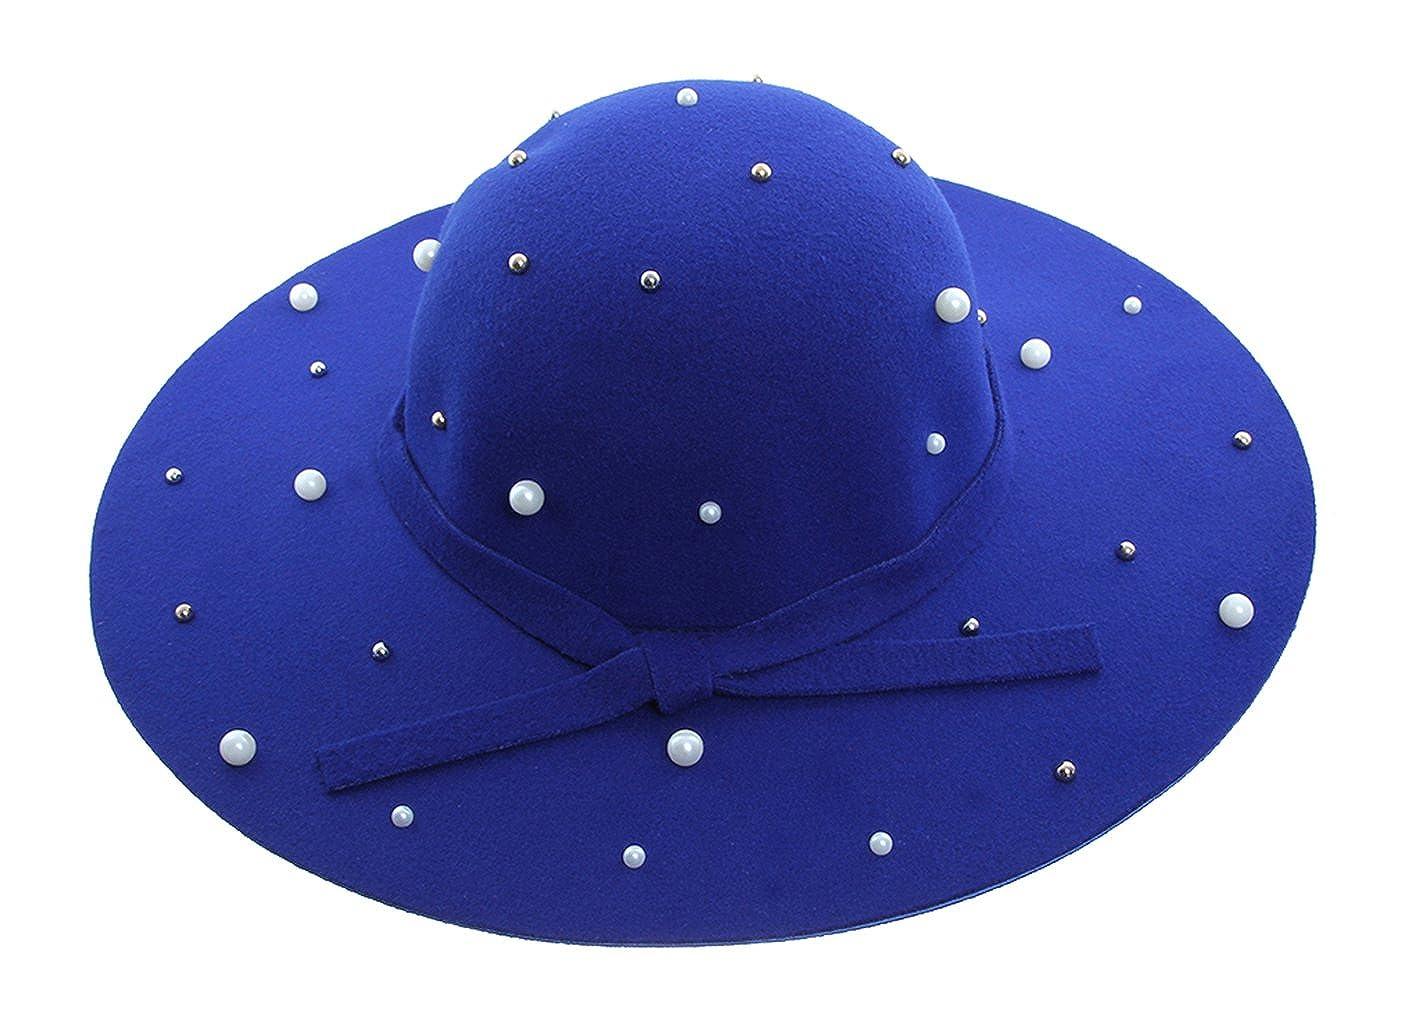 ACVIP Women Wide Brim Bowler Hat Floppy Felt Fedora Cap witn Faux Pearl